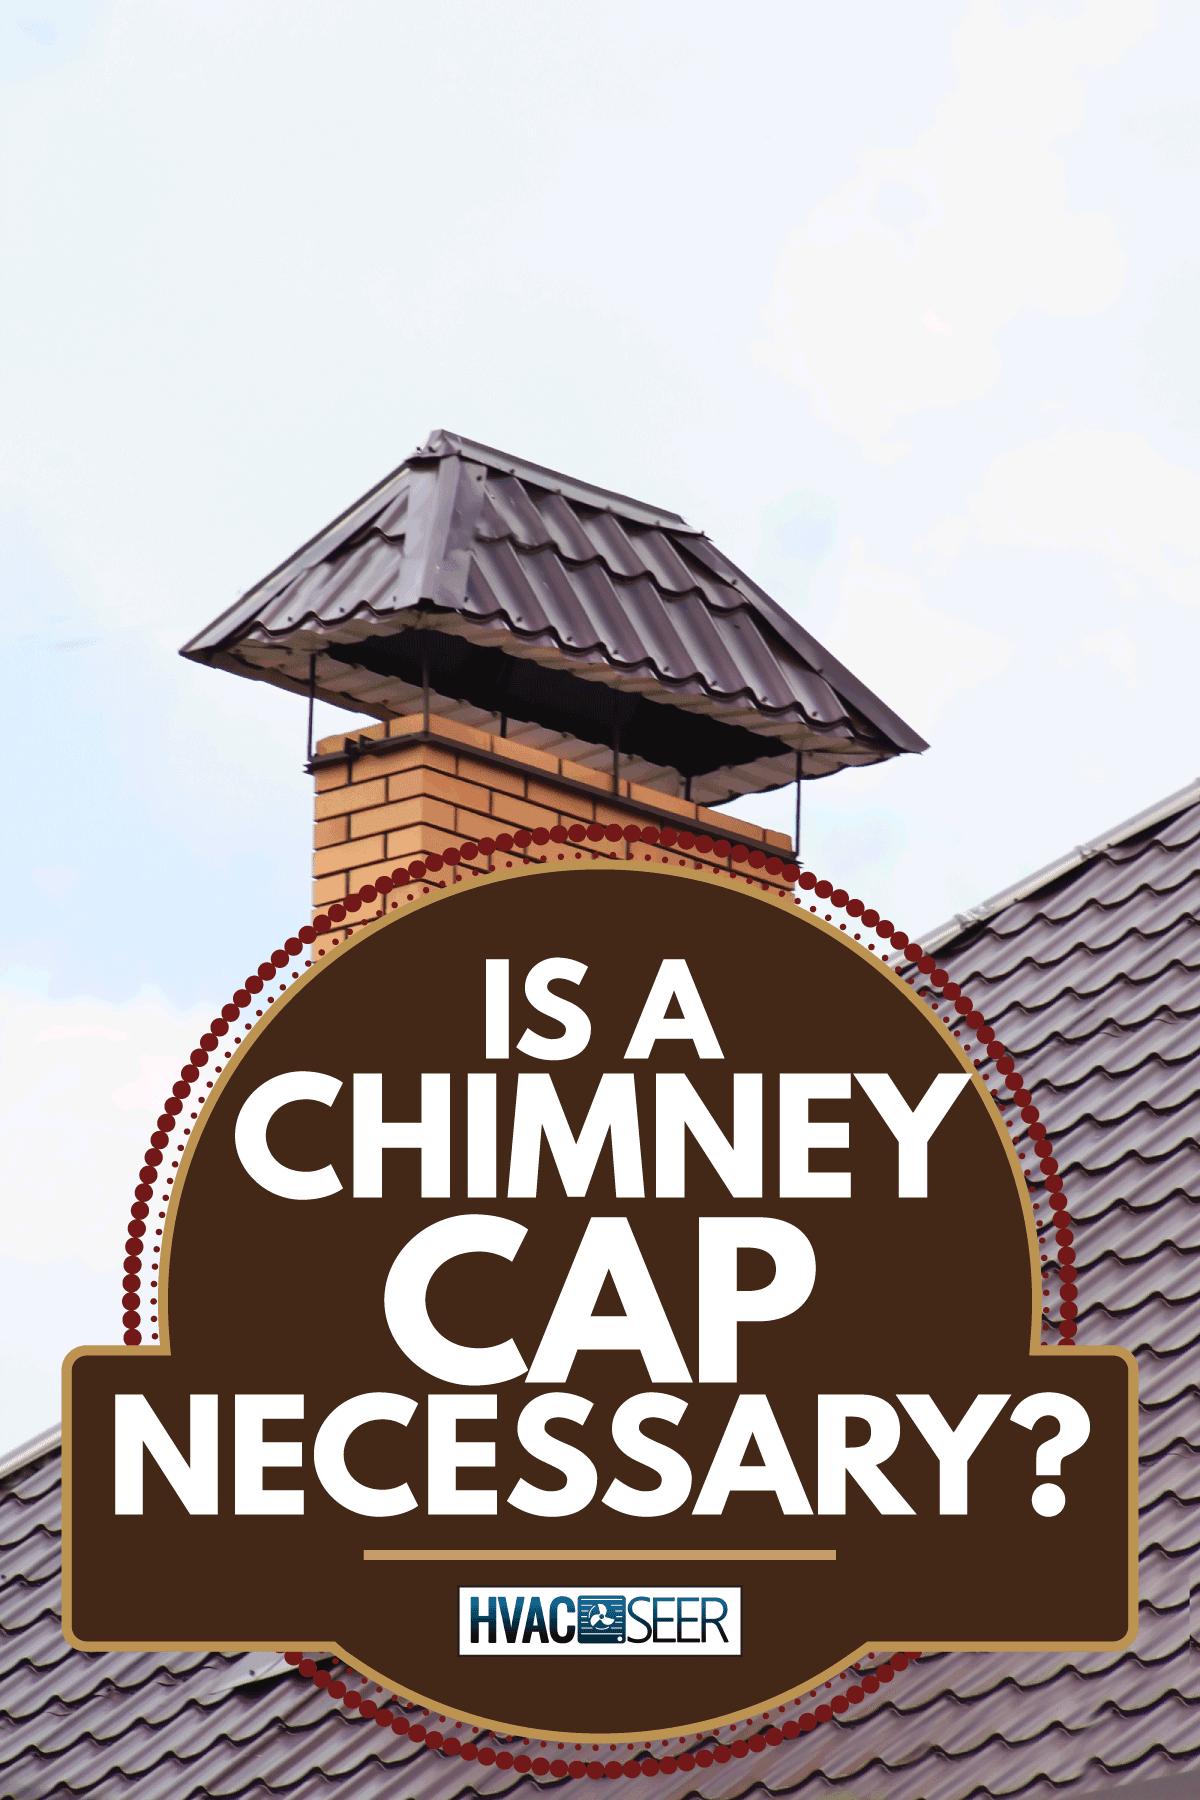 brick chimney with chimney cap. Is A Chimney Cap Necessary